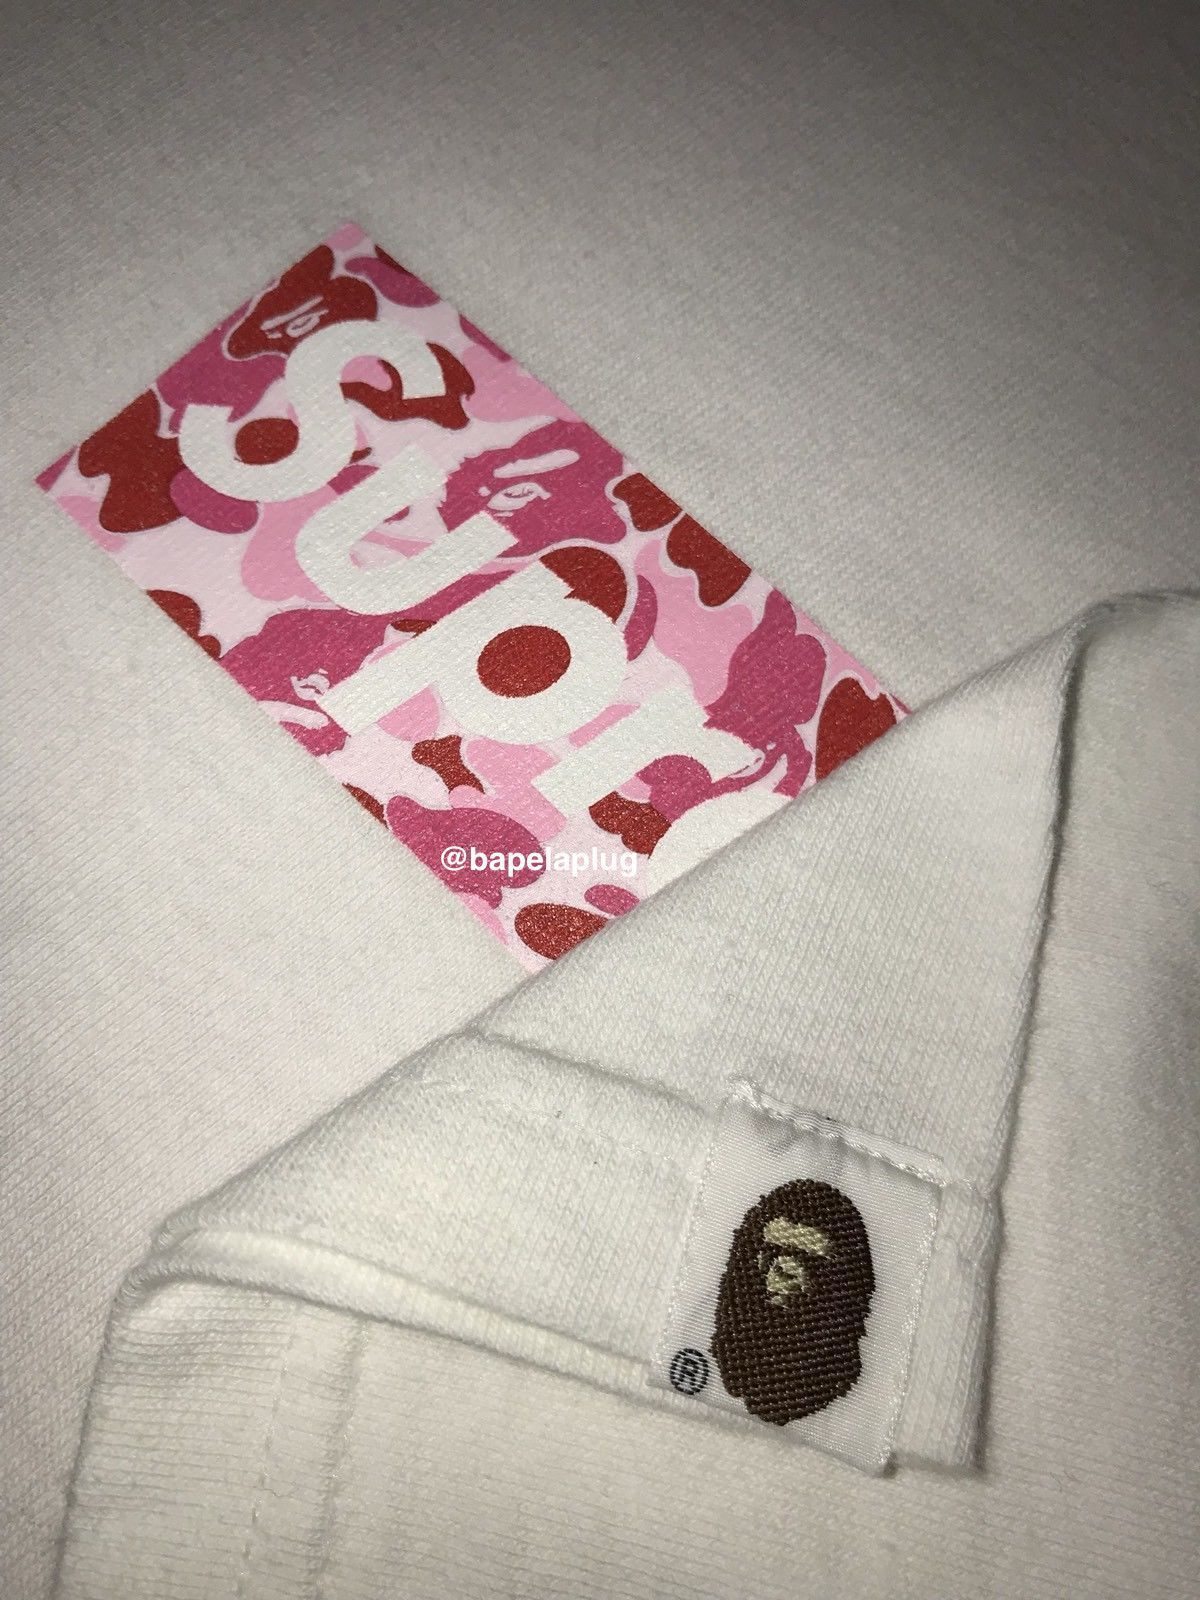 0f4801fb SUPREME x BAPE Pink ABC Camo Box Logo T-shirt WHITE L Large Japan A bathing  ape